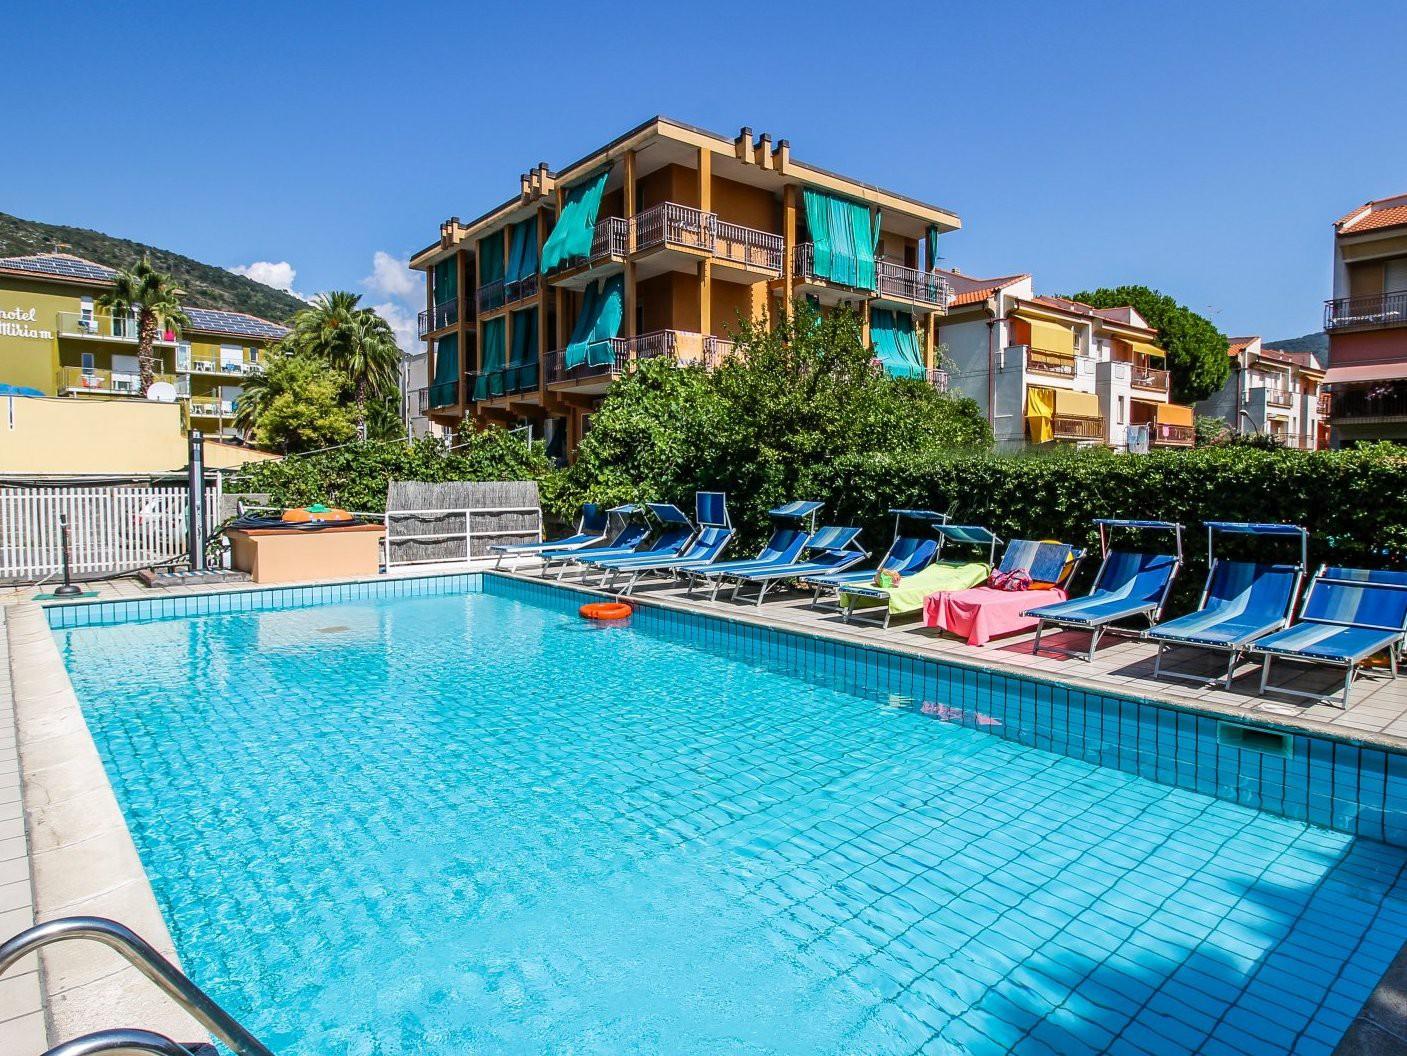 Hotel Minerva*** - Pietra Ligure